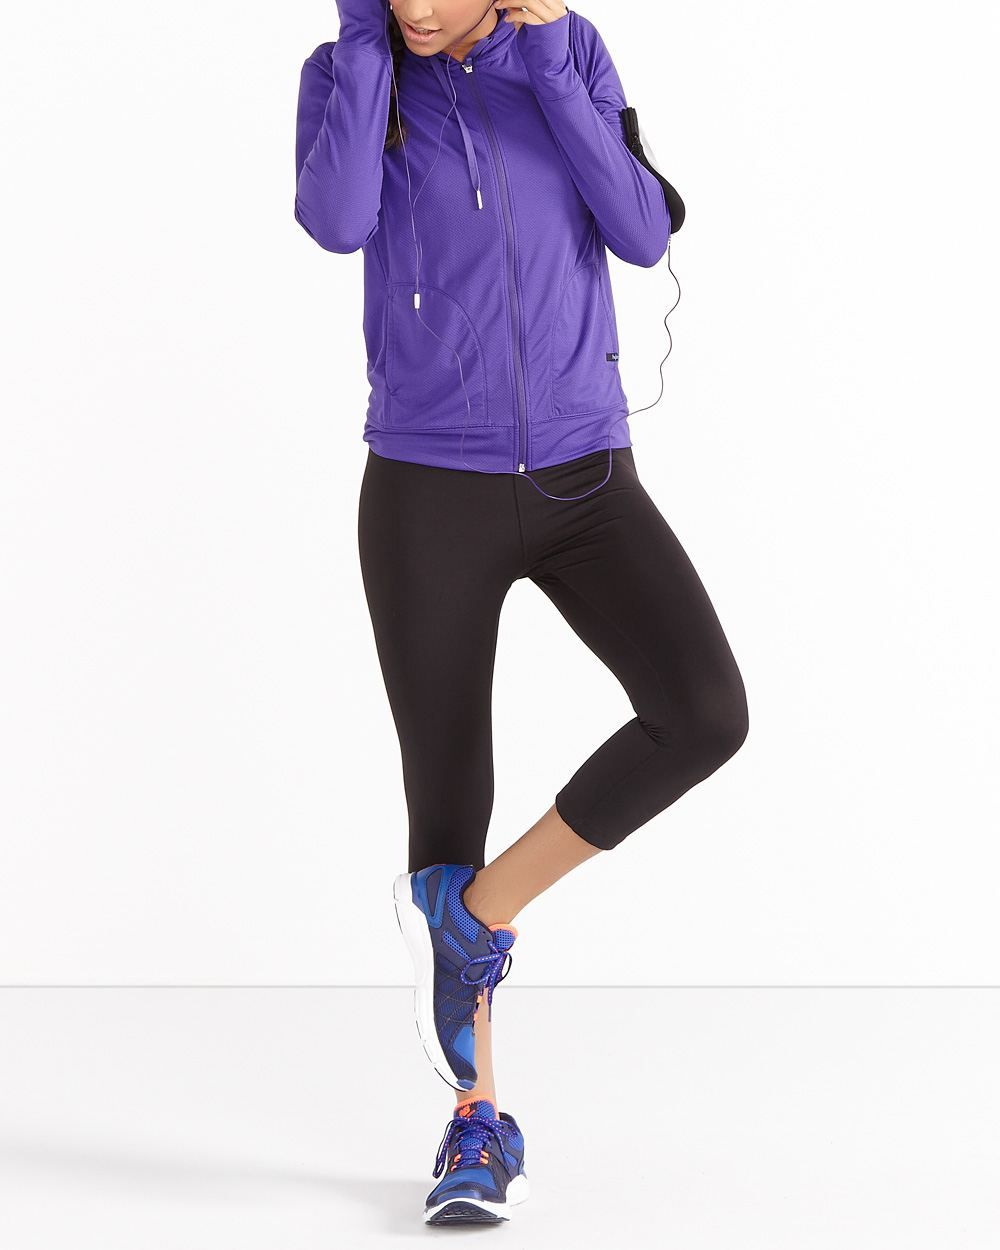 c60d3da320 Hyba Compression Capri Legging | play clothes | Capri leggings ...